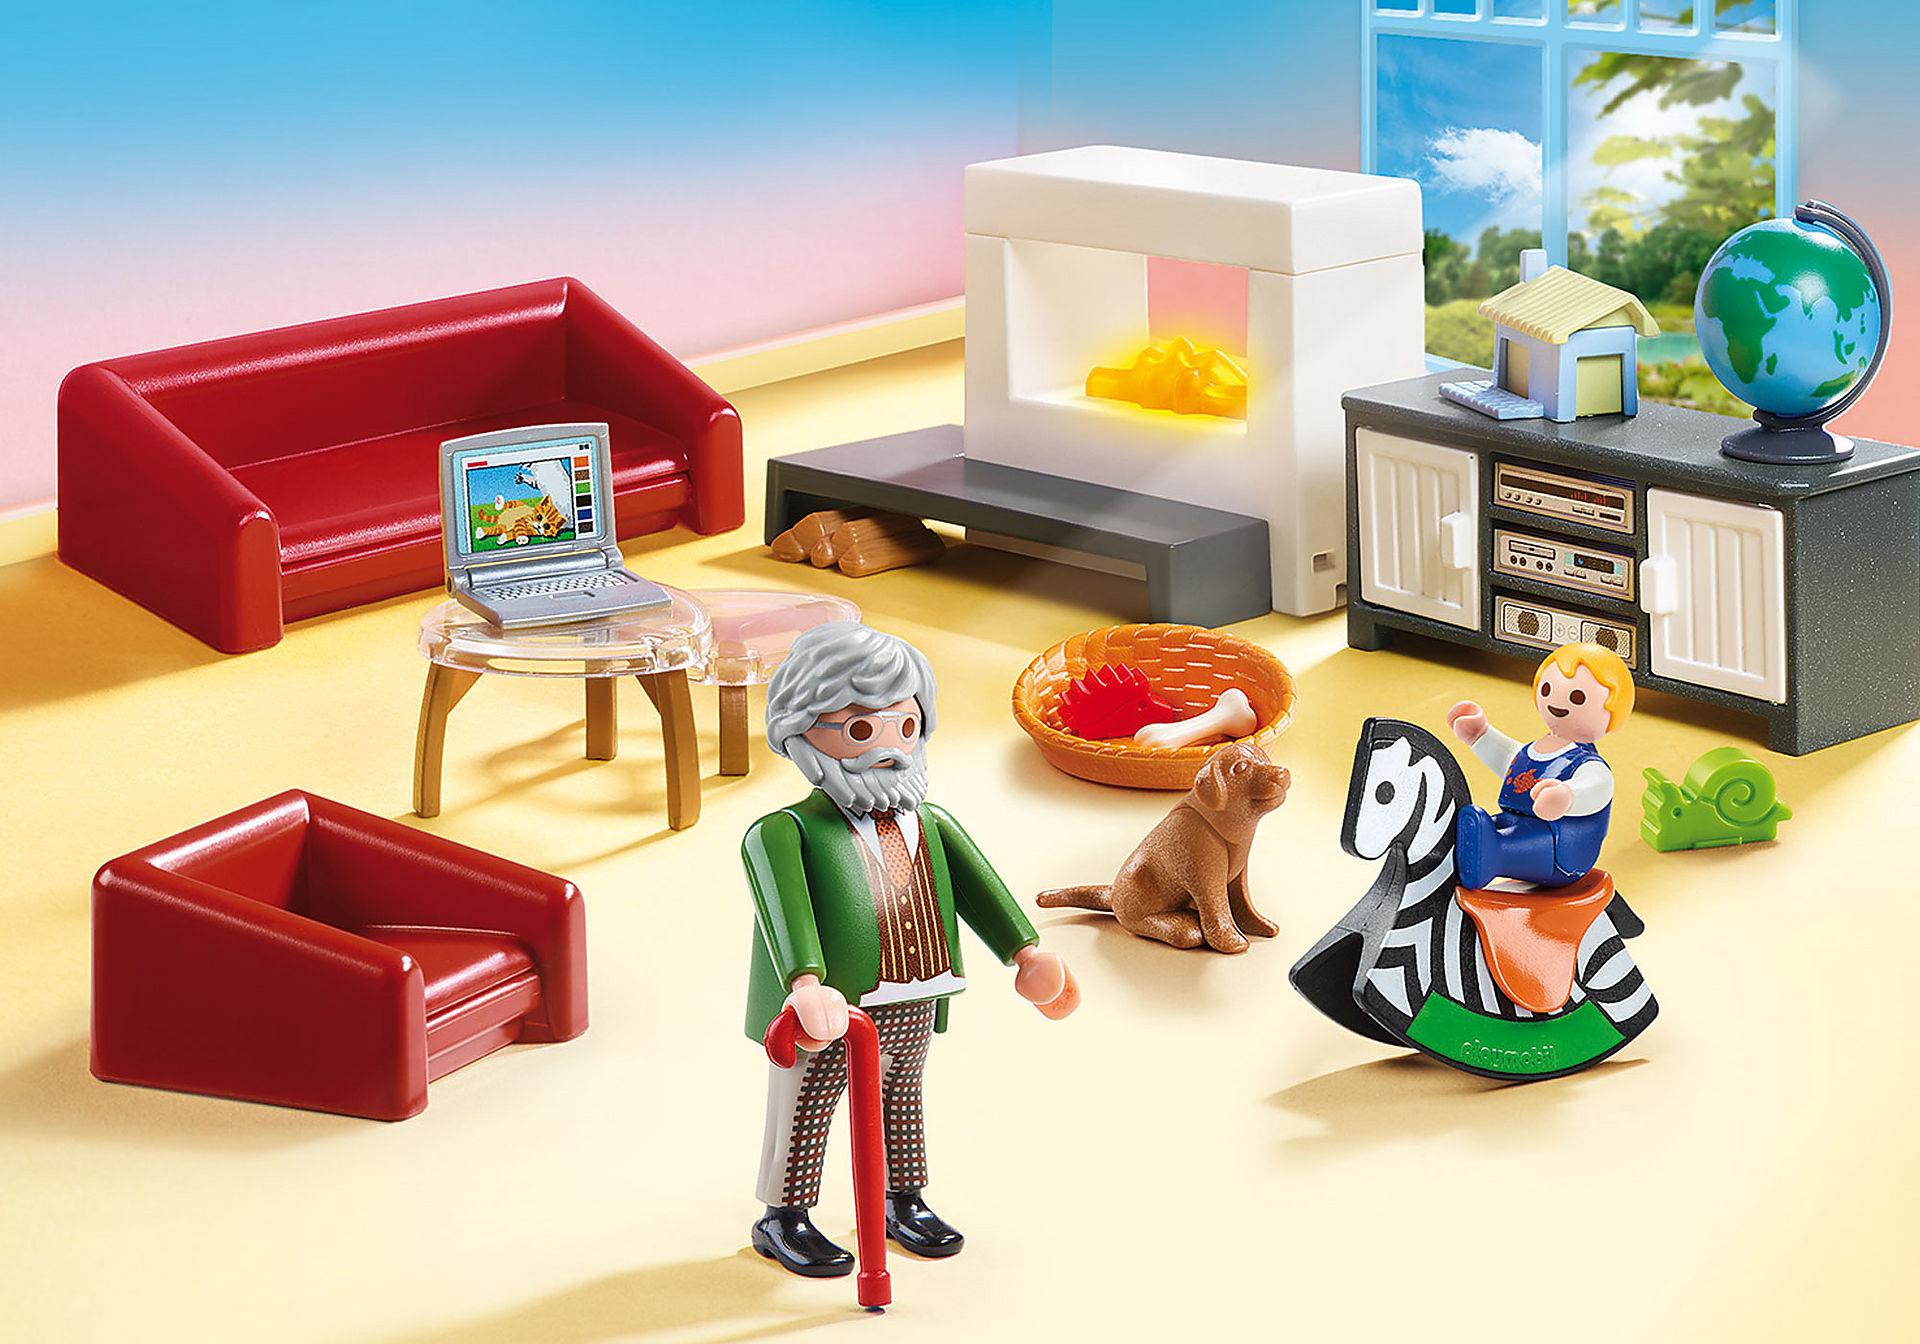 http://media.playmobil.com/i/playmobil/70207_product_detail/Gemütliches Wohnzimmer